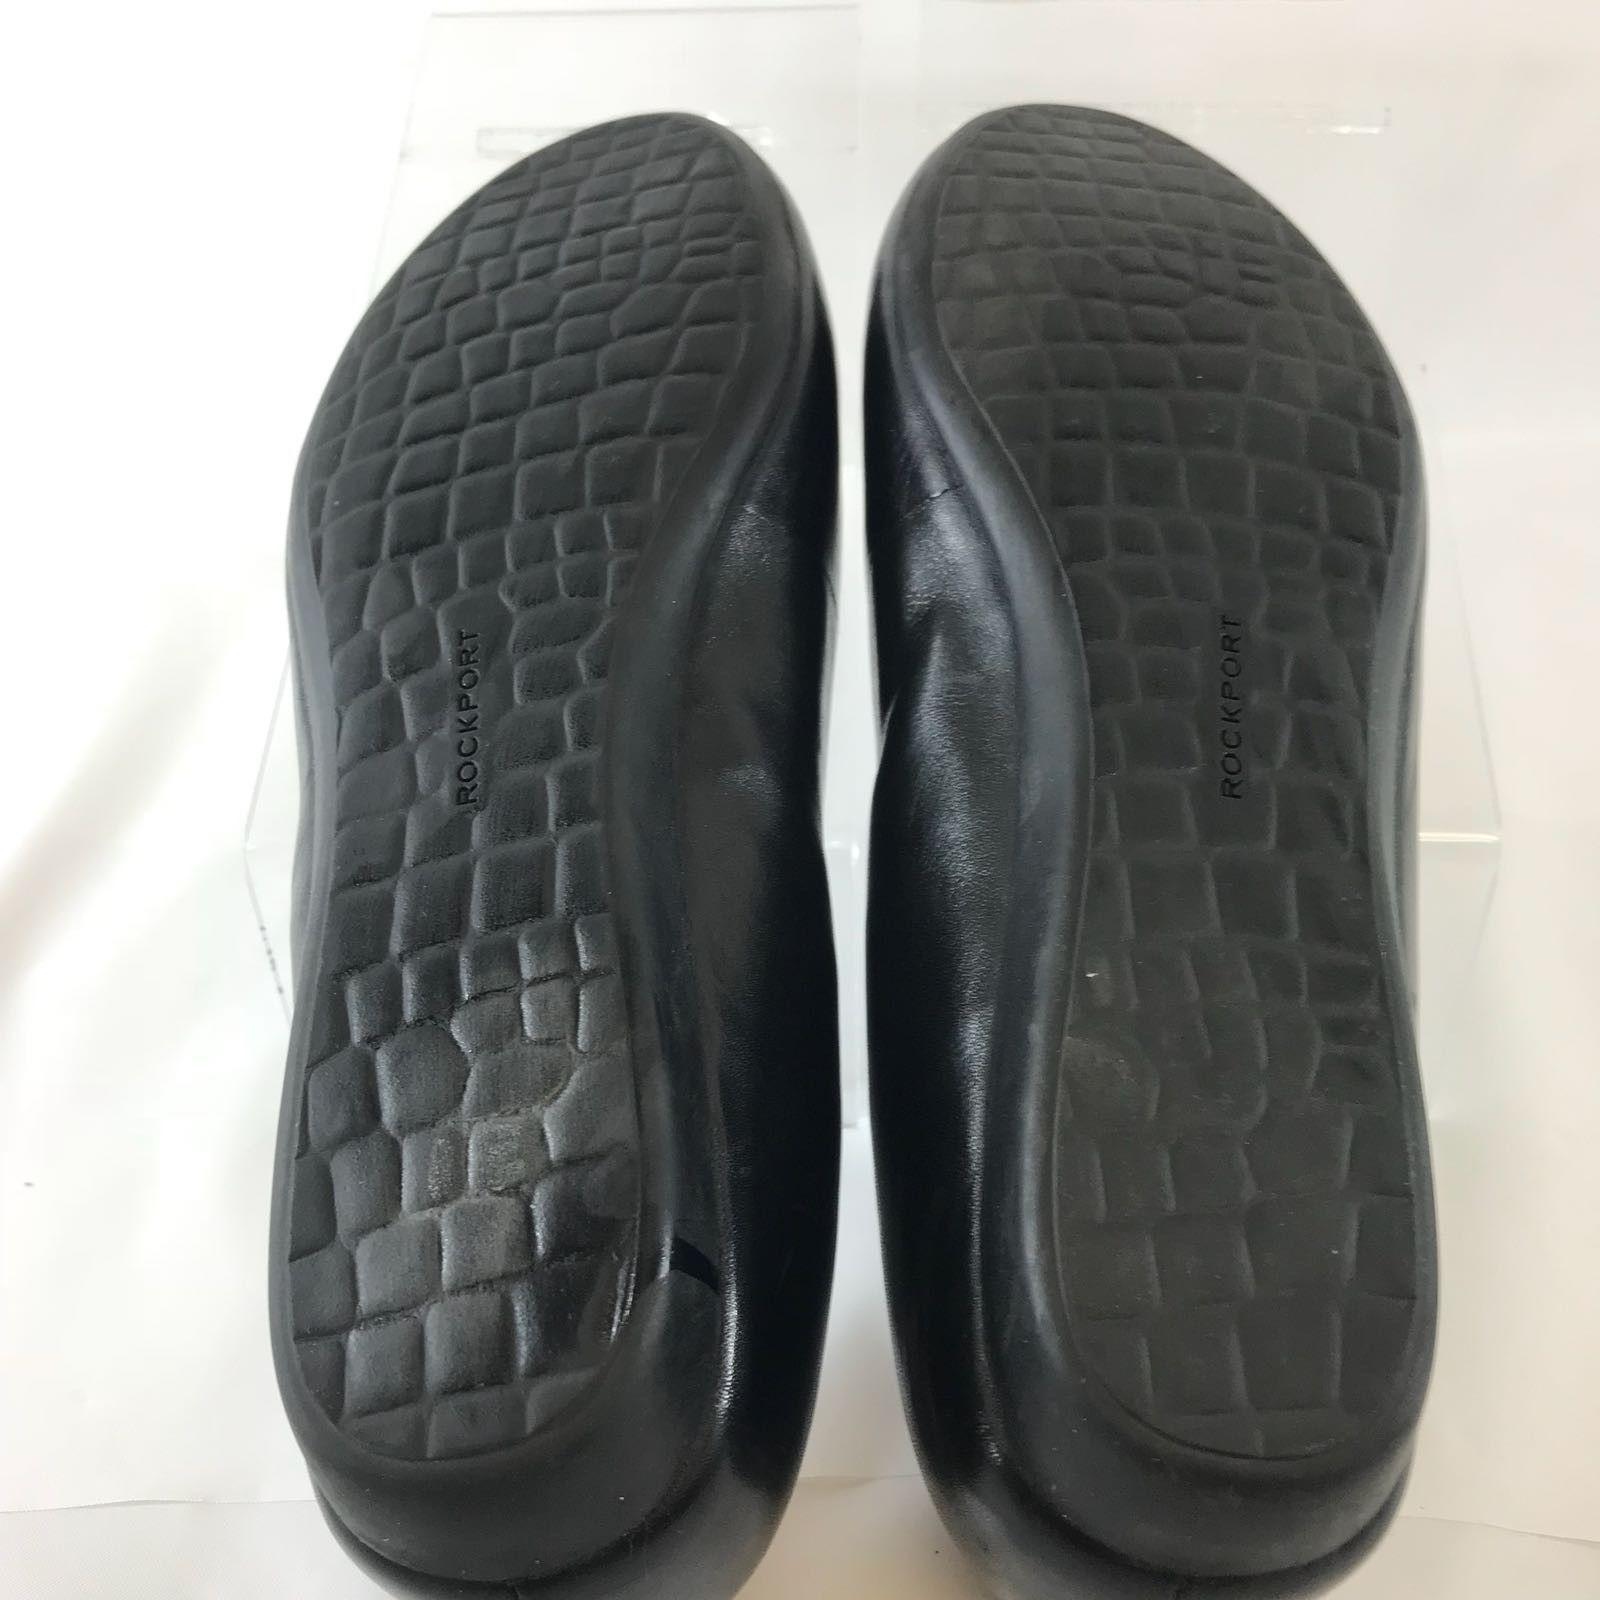 Rockport Women's Shoes Adiprene Ballet Flats Black Leather High Comfort 9.5M